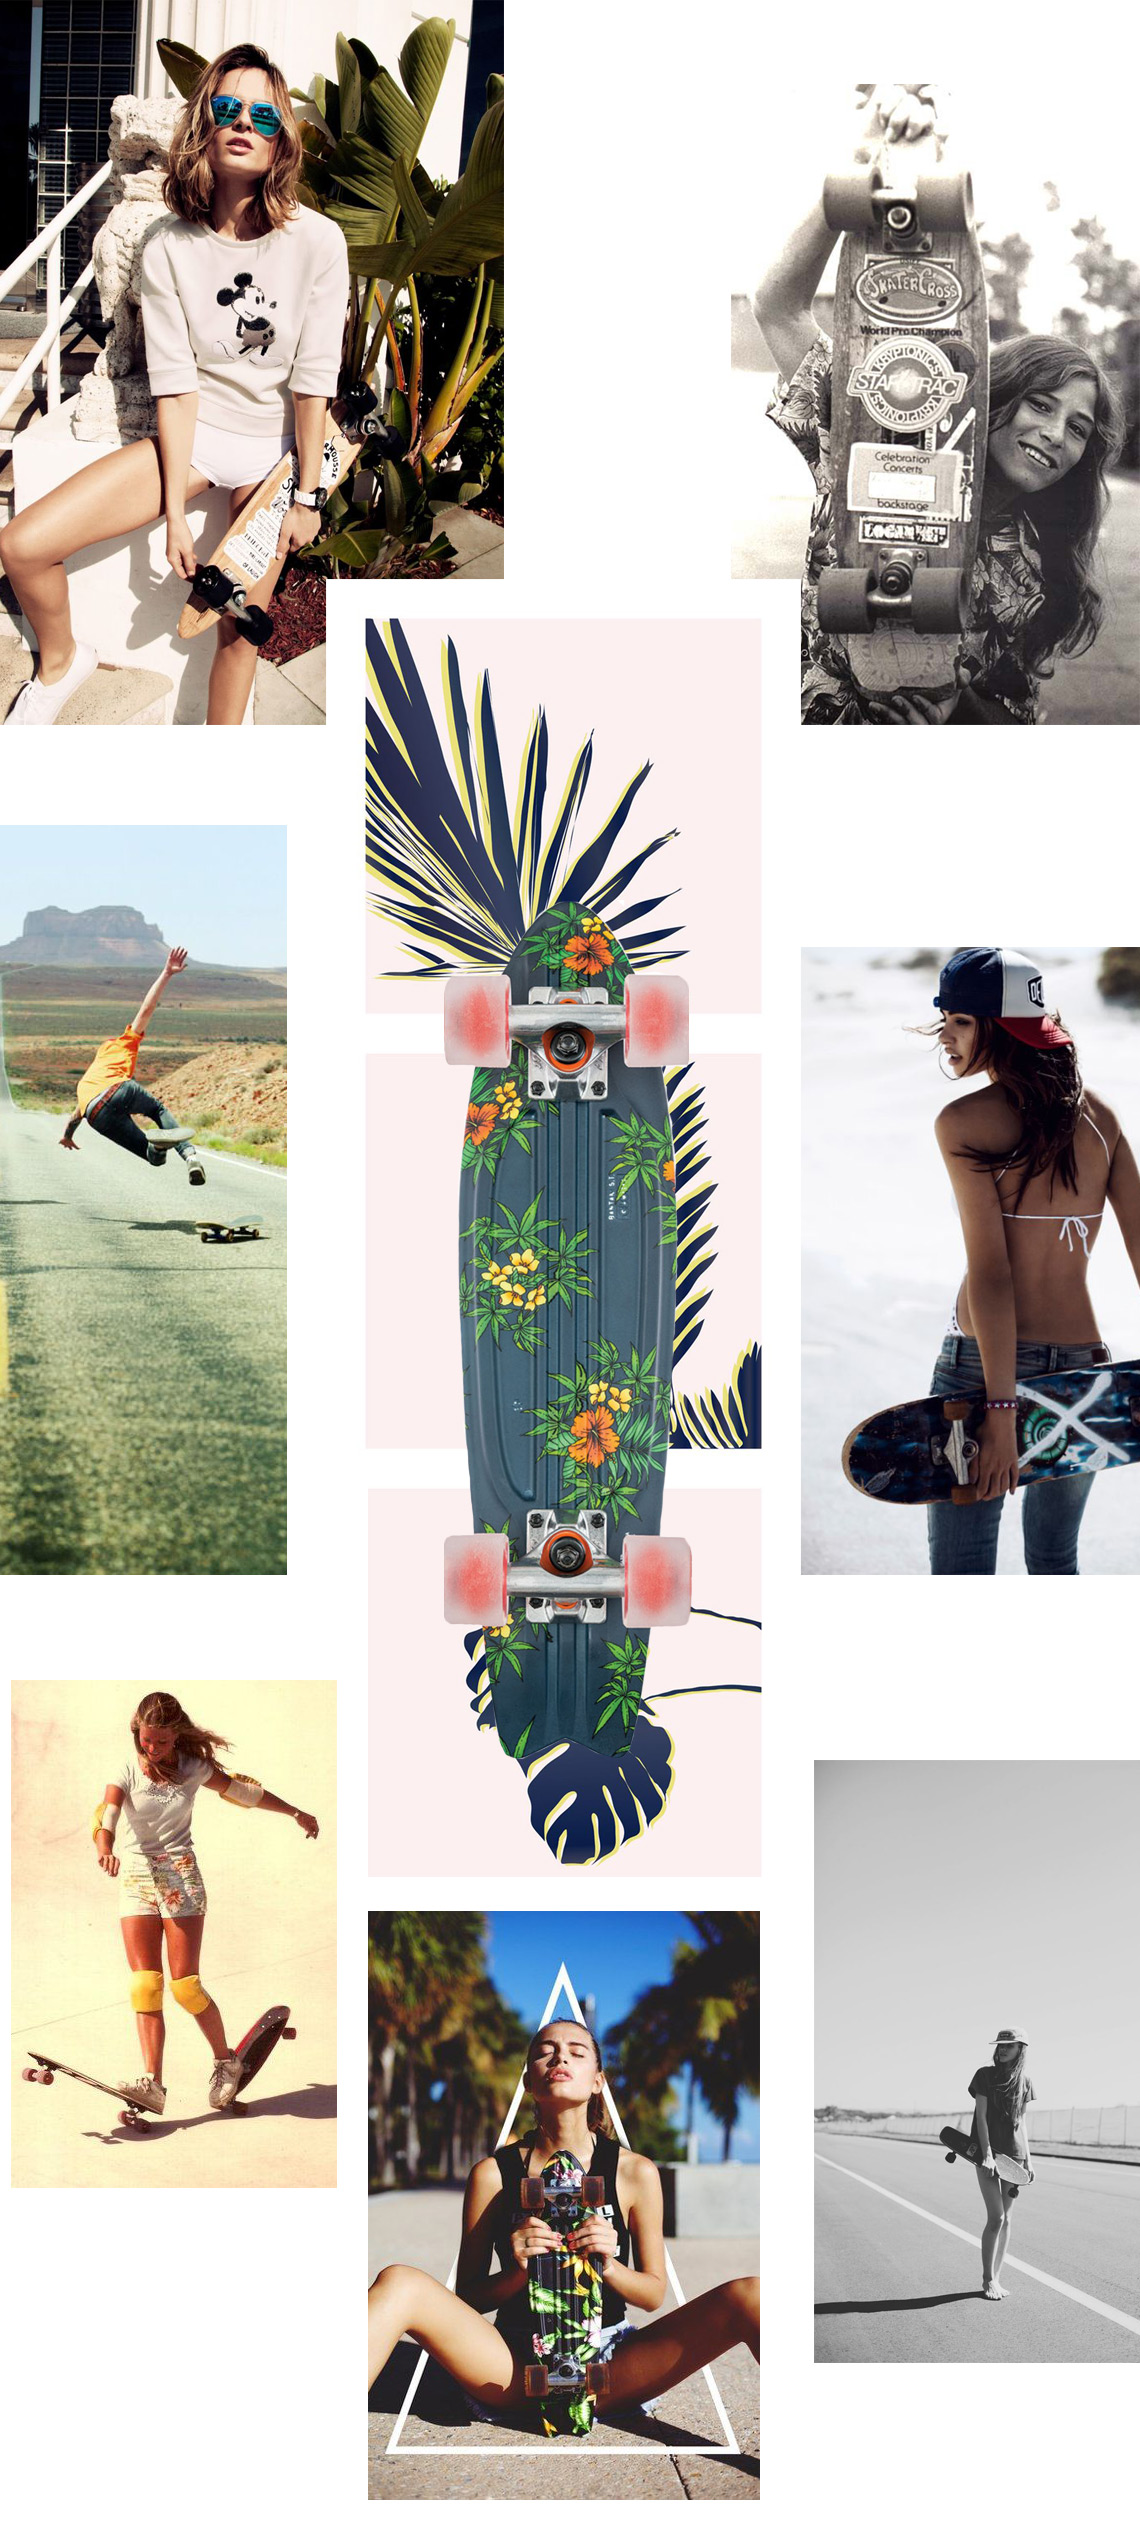 skate-globe-bantam-shopping-selector-moodboard-folkr-1